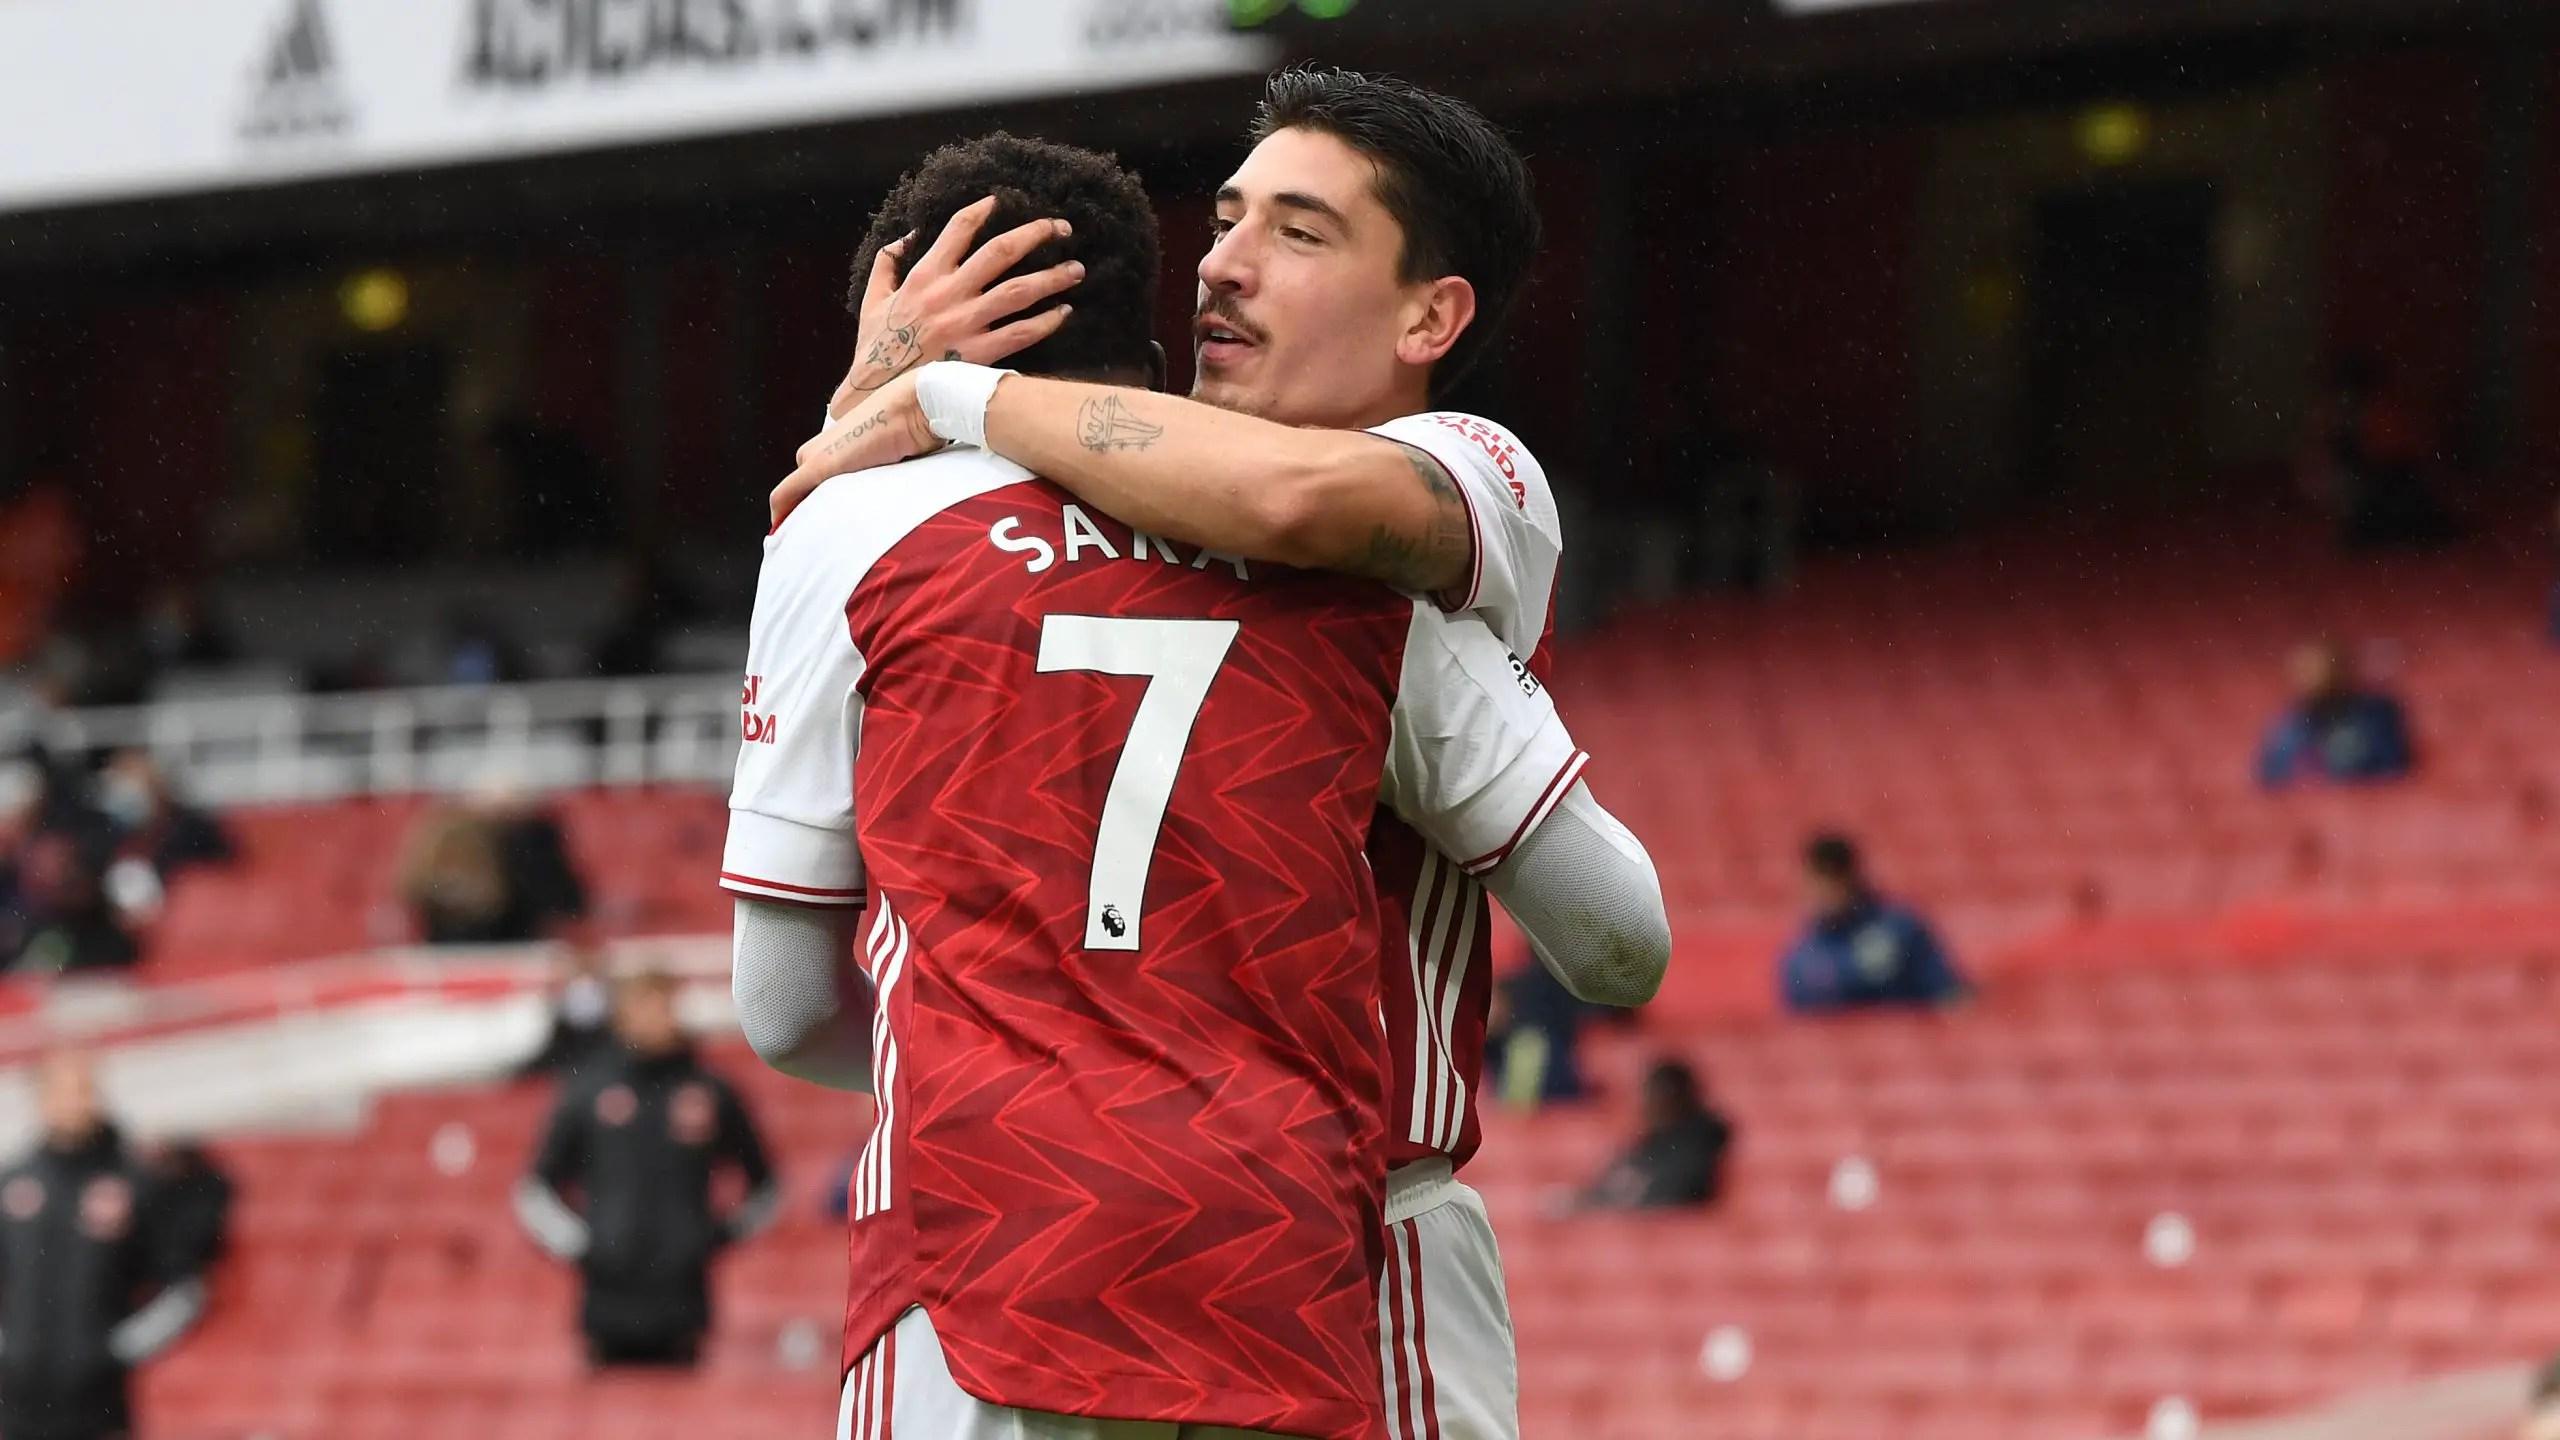 Arsenal Goalie Leno: Saka Will Be World Class Player